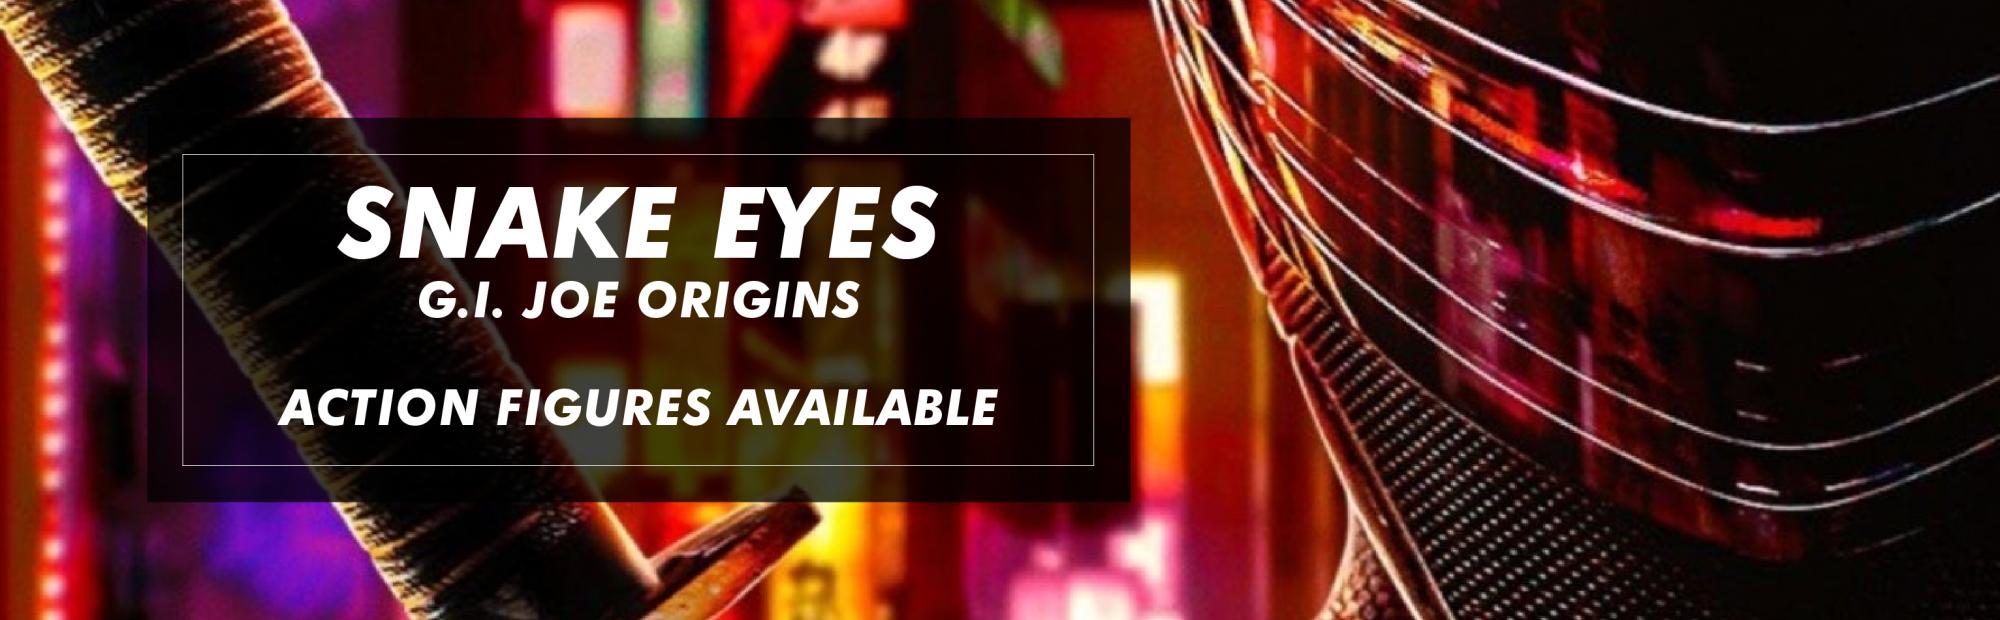 Snake Eyes G.I. Joe Origins Action Figures